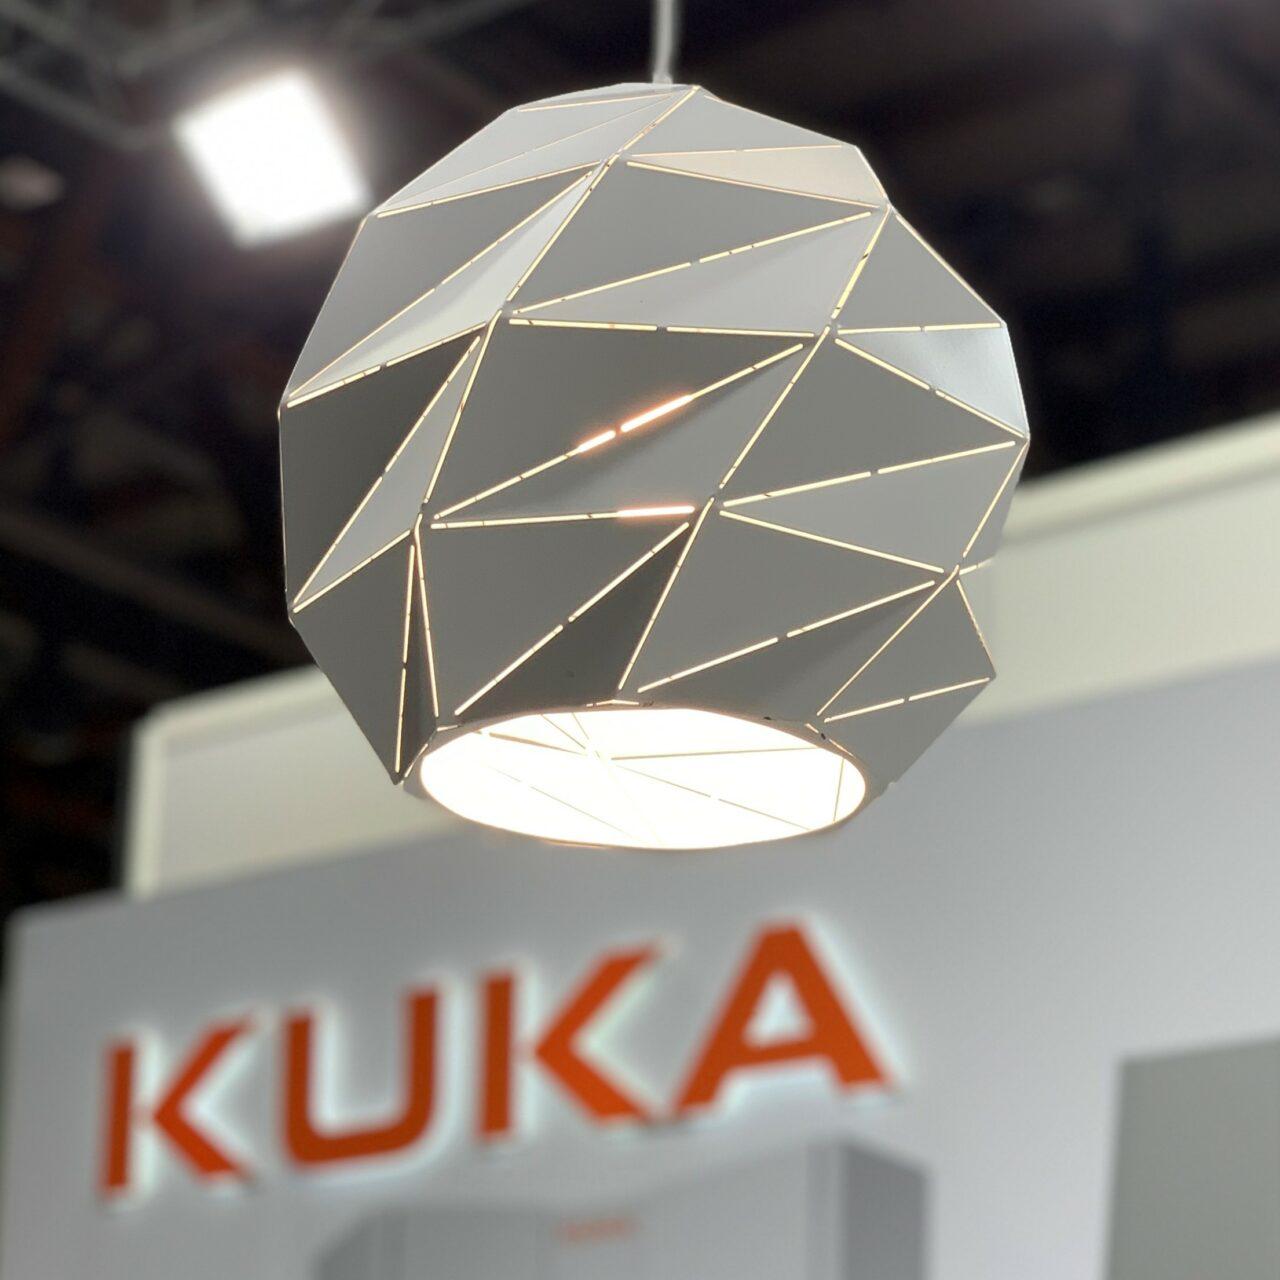 KUKA_Euroguss 2020